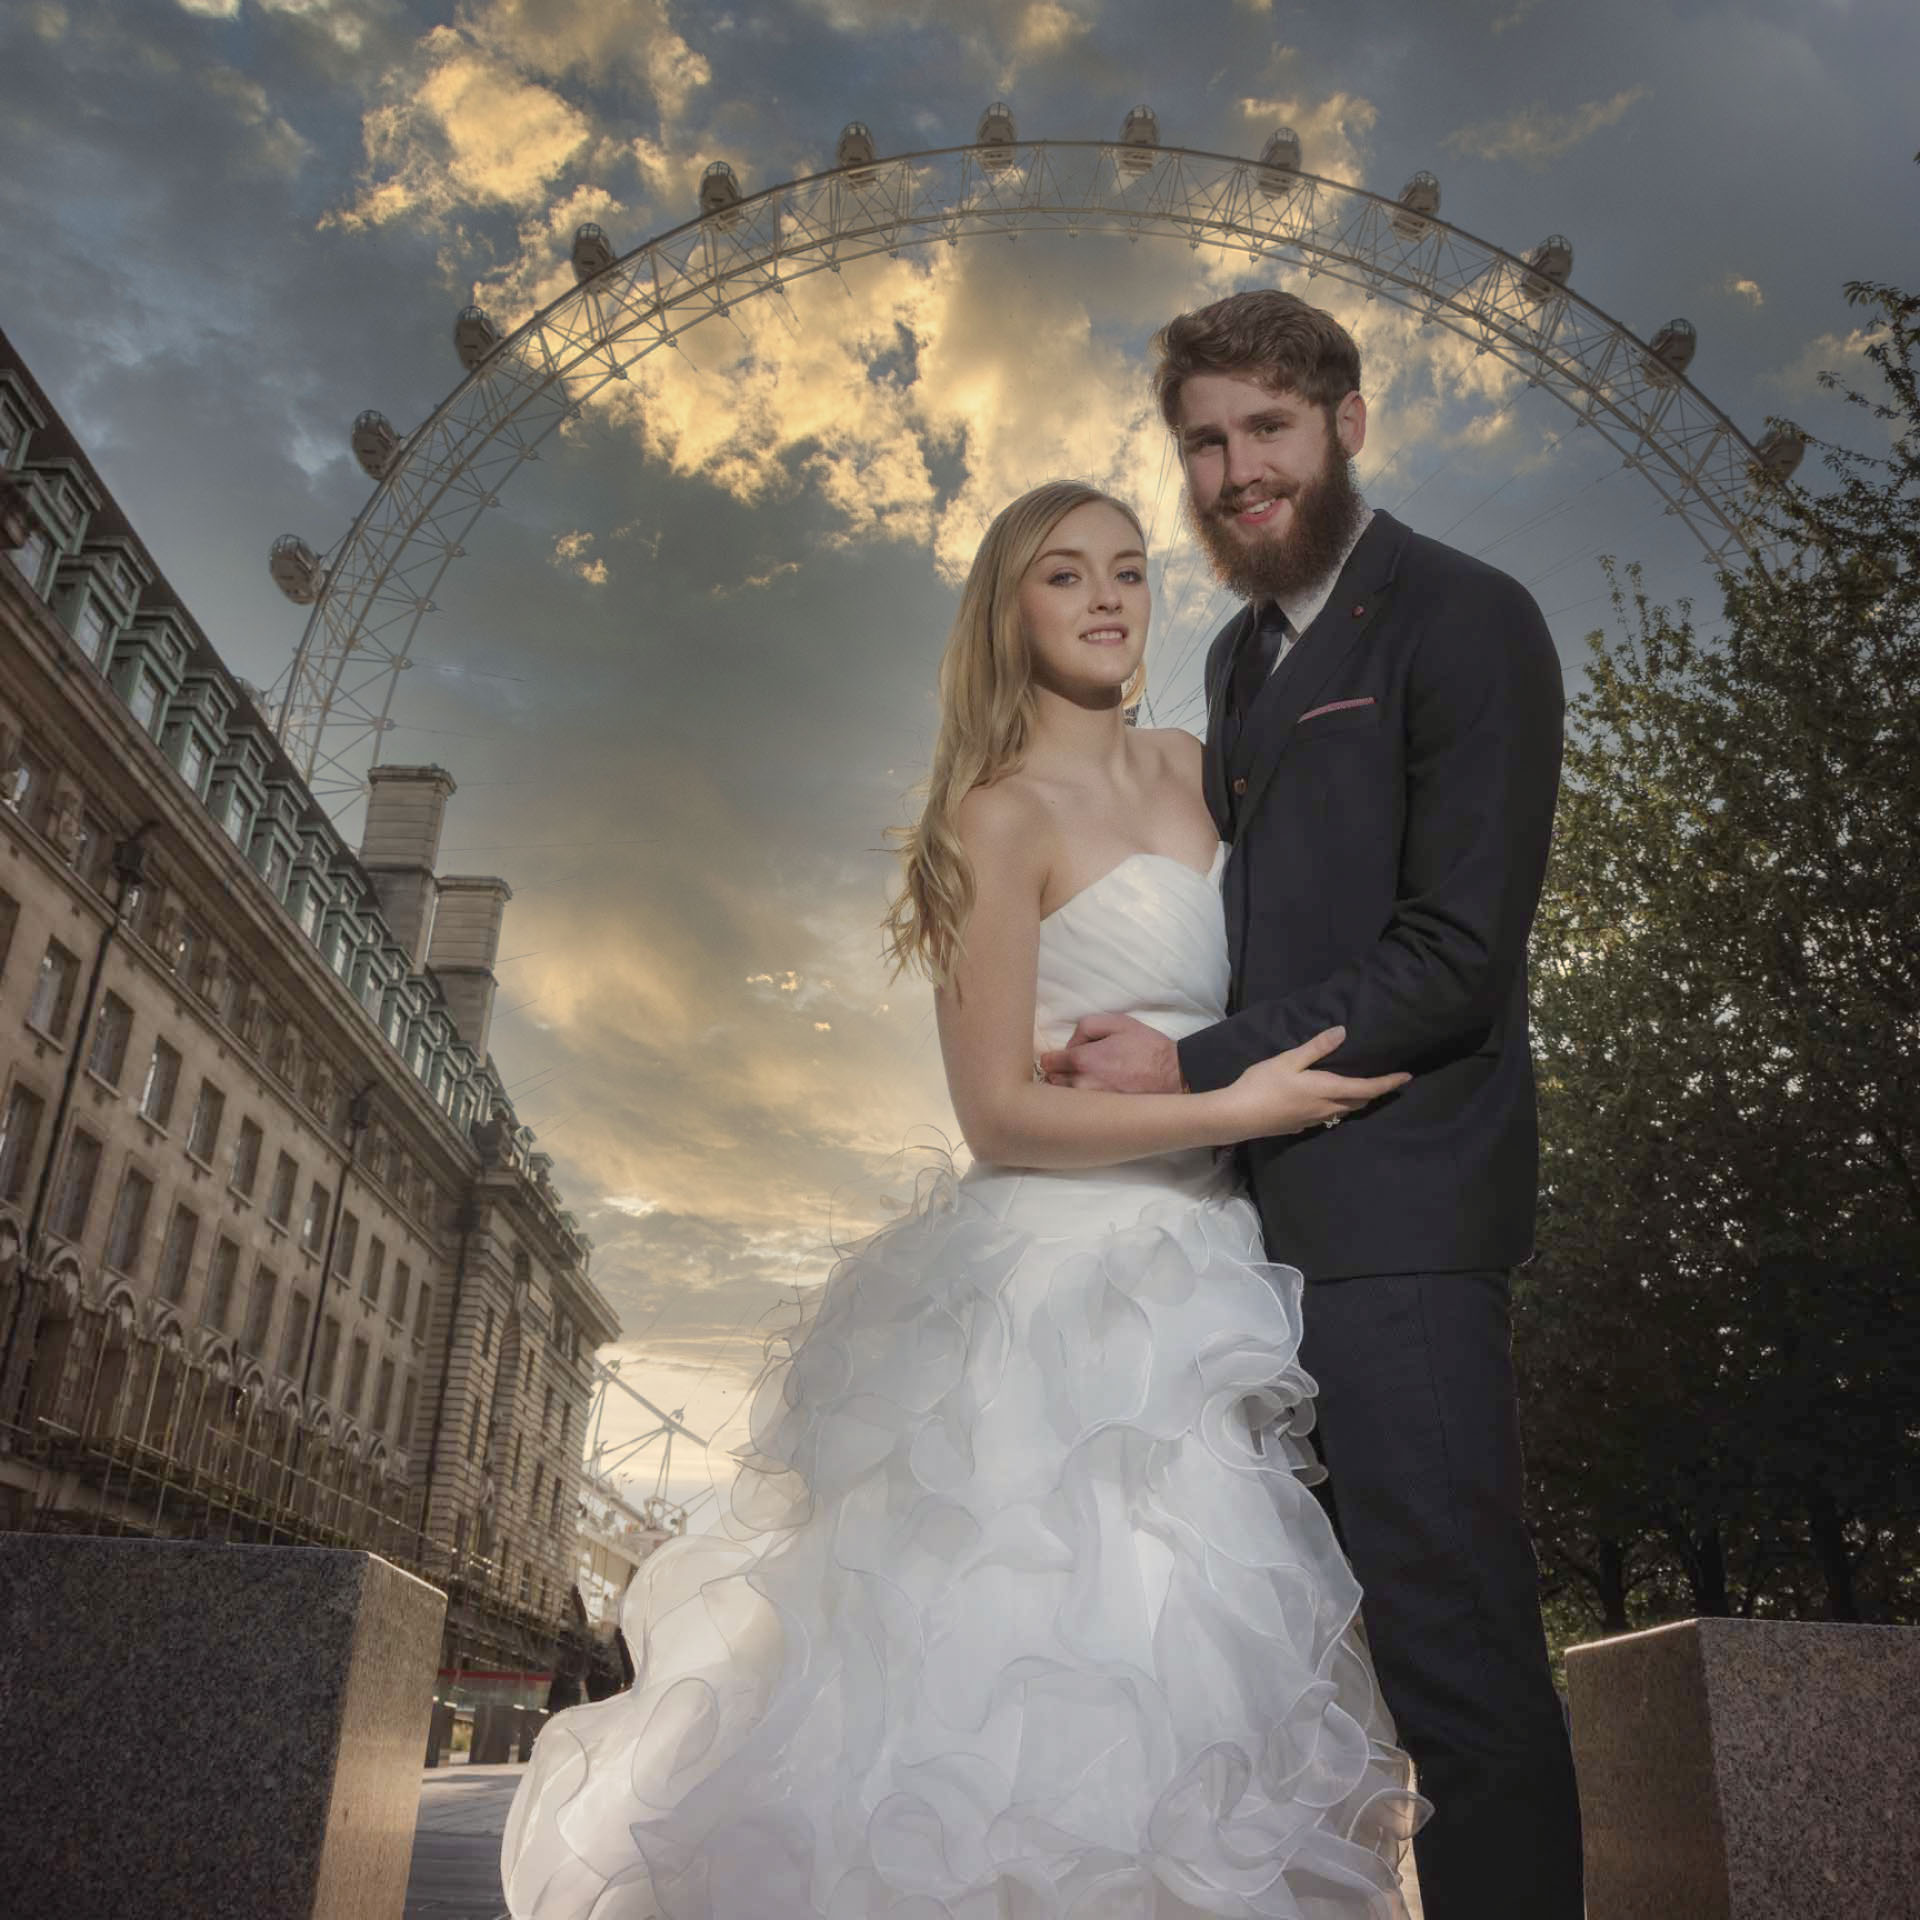 Wedding photos at the London Eye